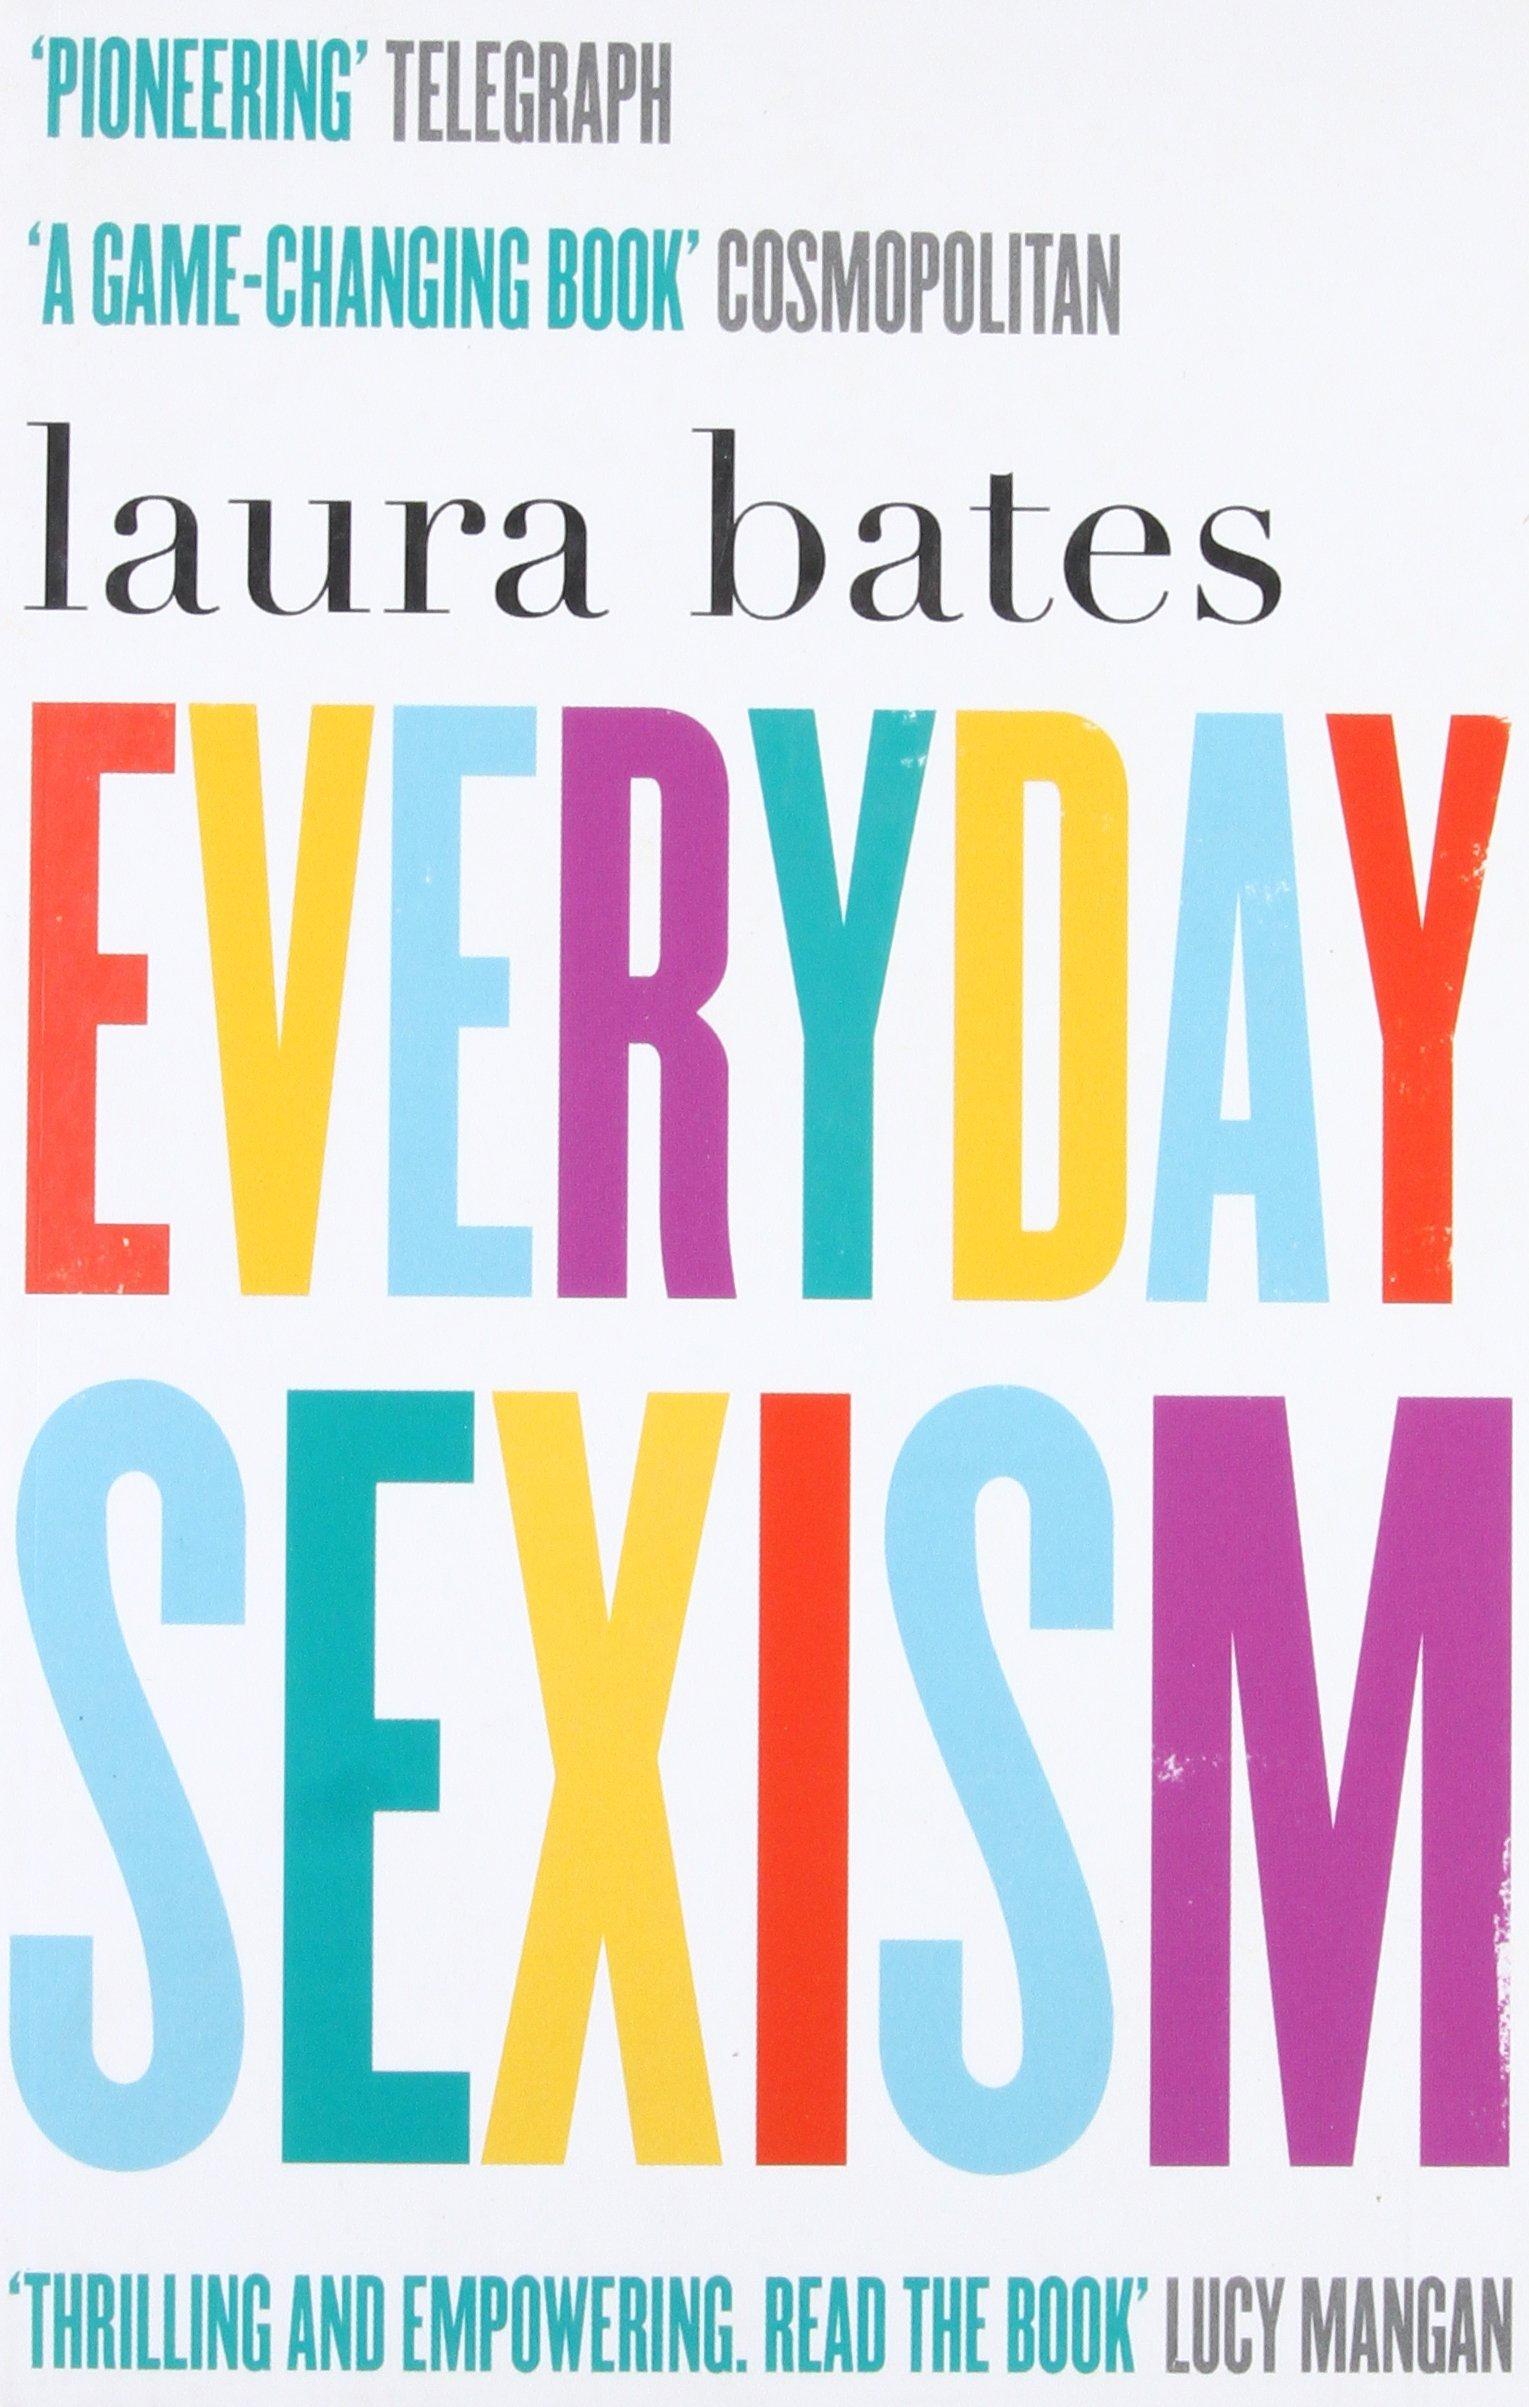 Everyday Sexism: Amazon.co.uk: Laura Bates: 9781471149207: Books